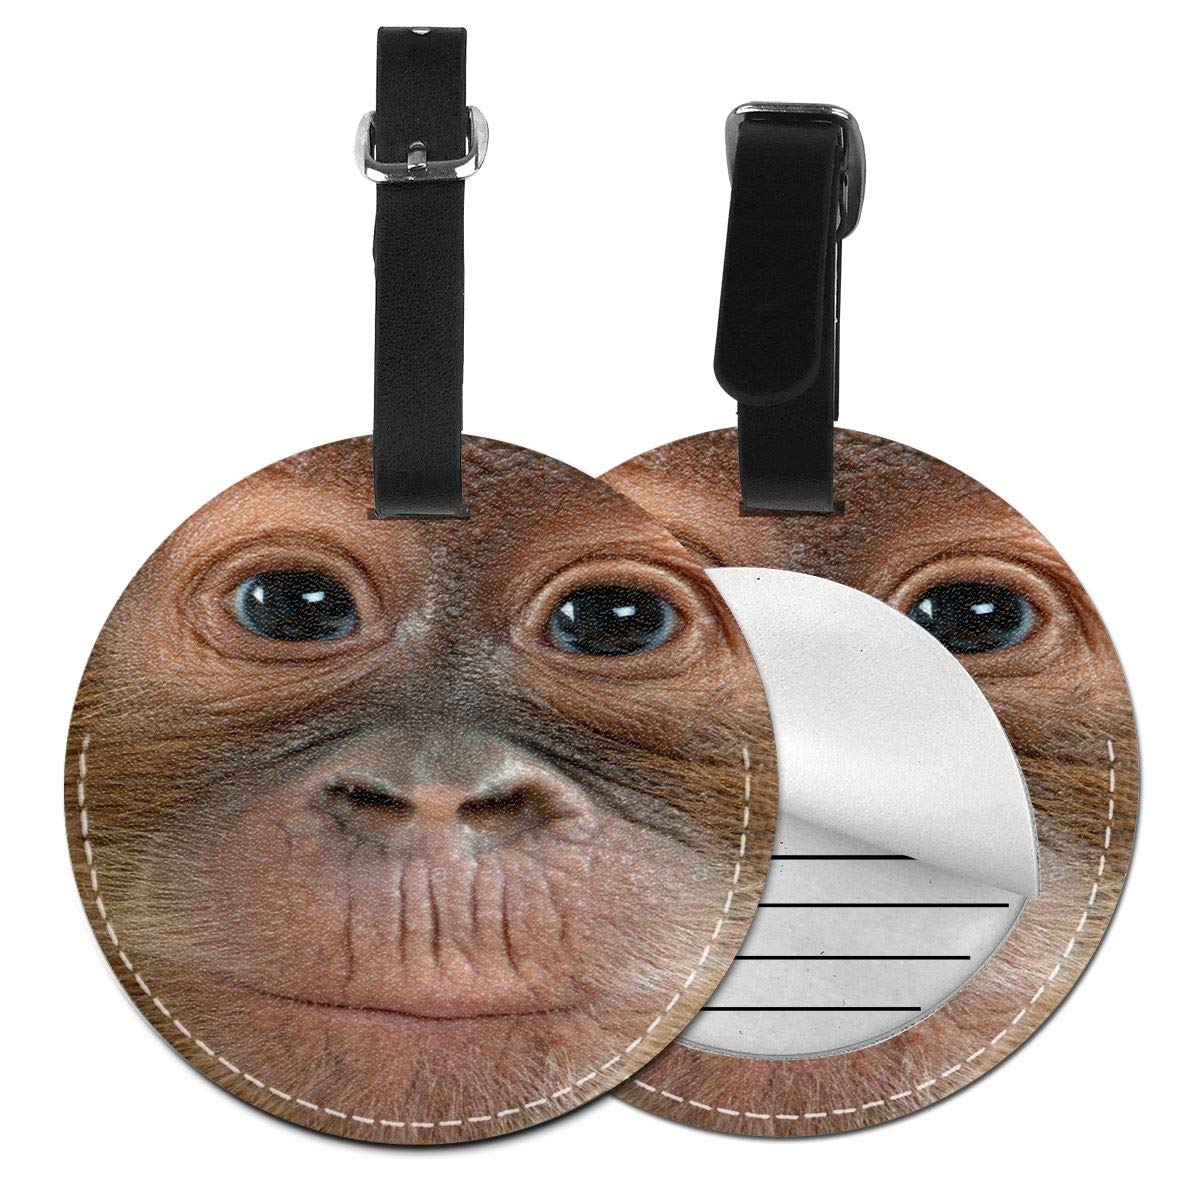 Free-2 Big Face Baby Orangutan Luggage Tag 3D Print Leather Travel Bag ID Card